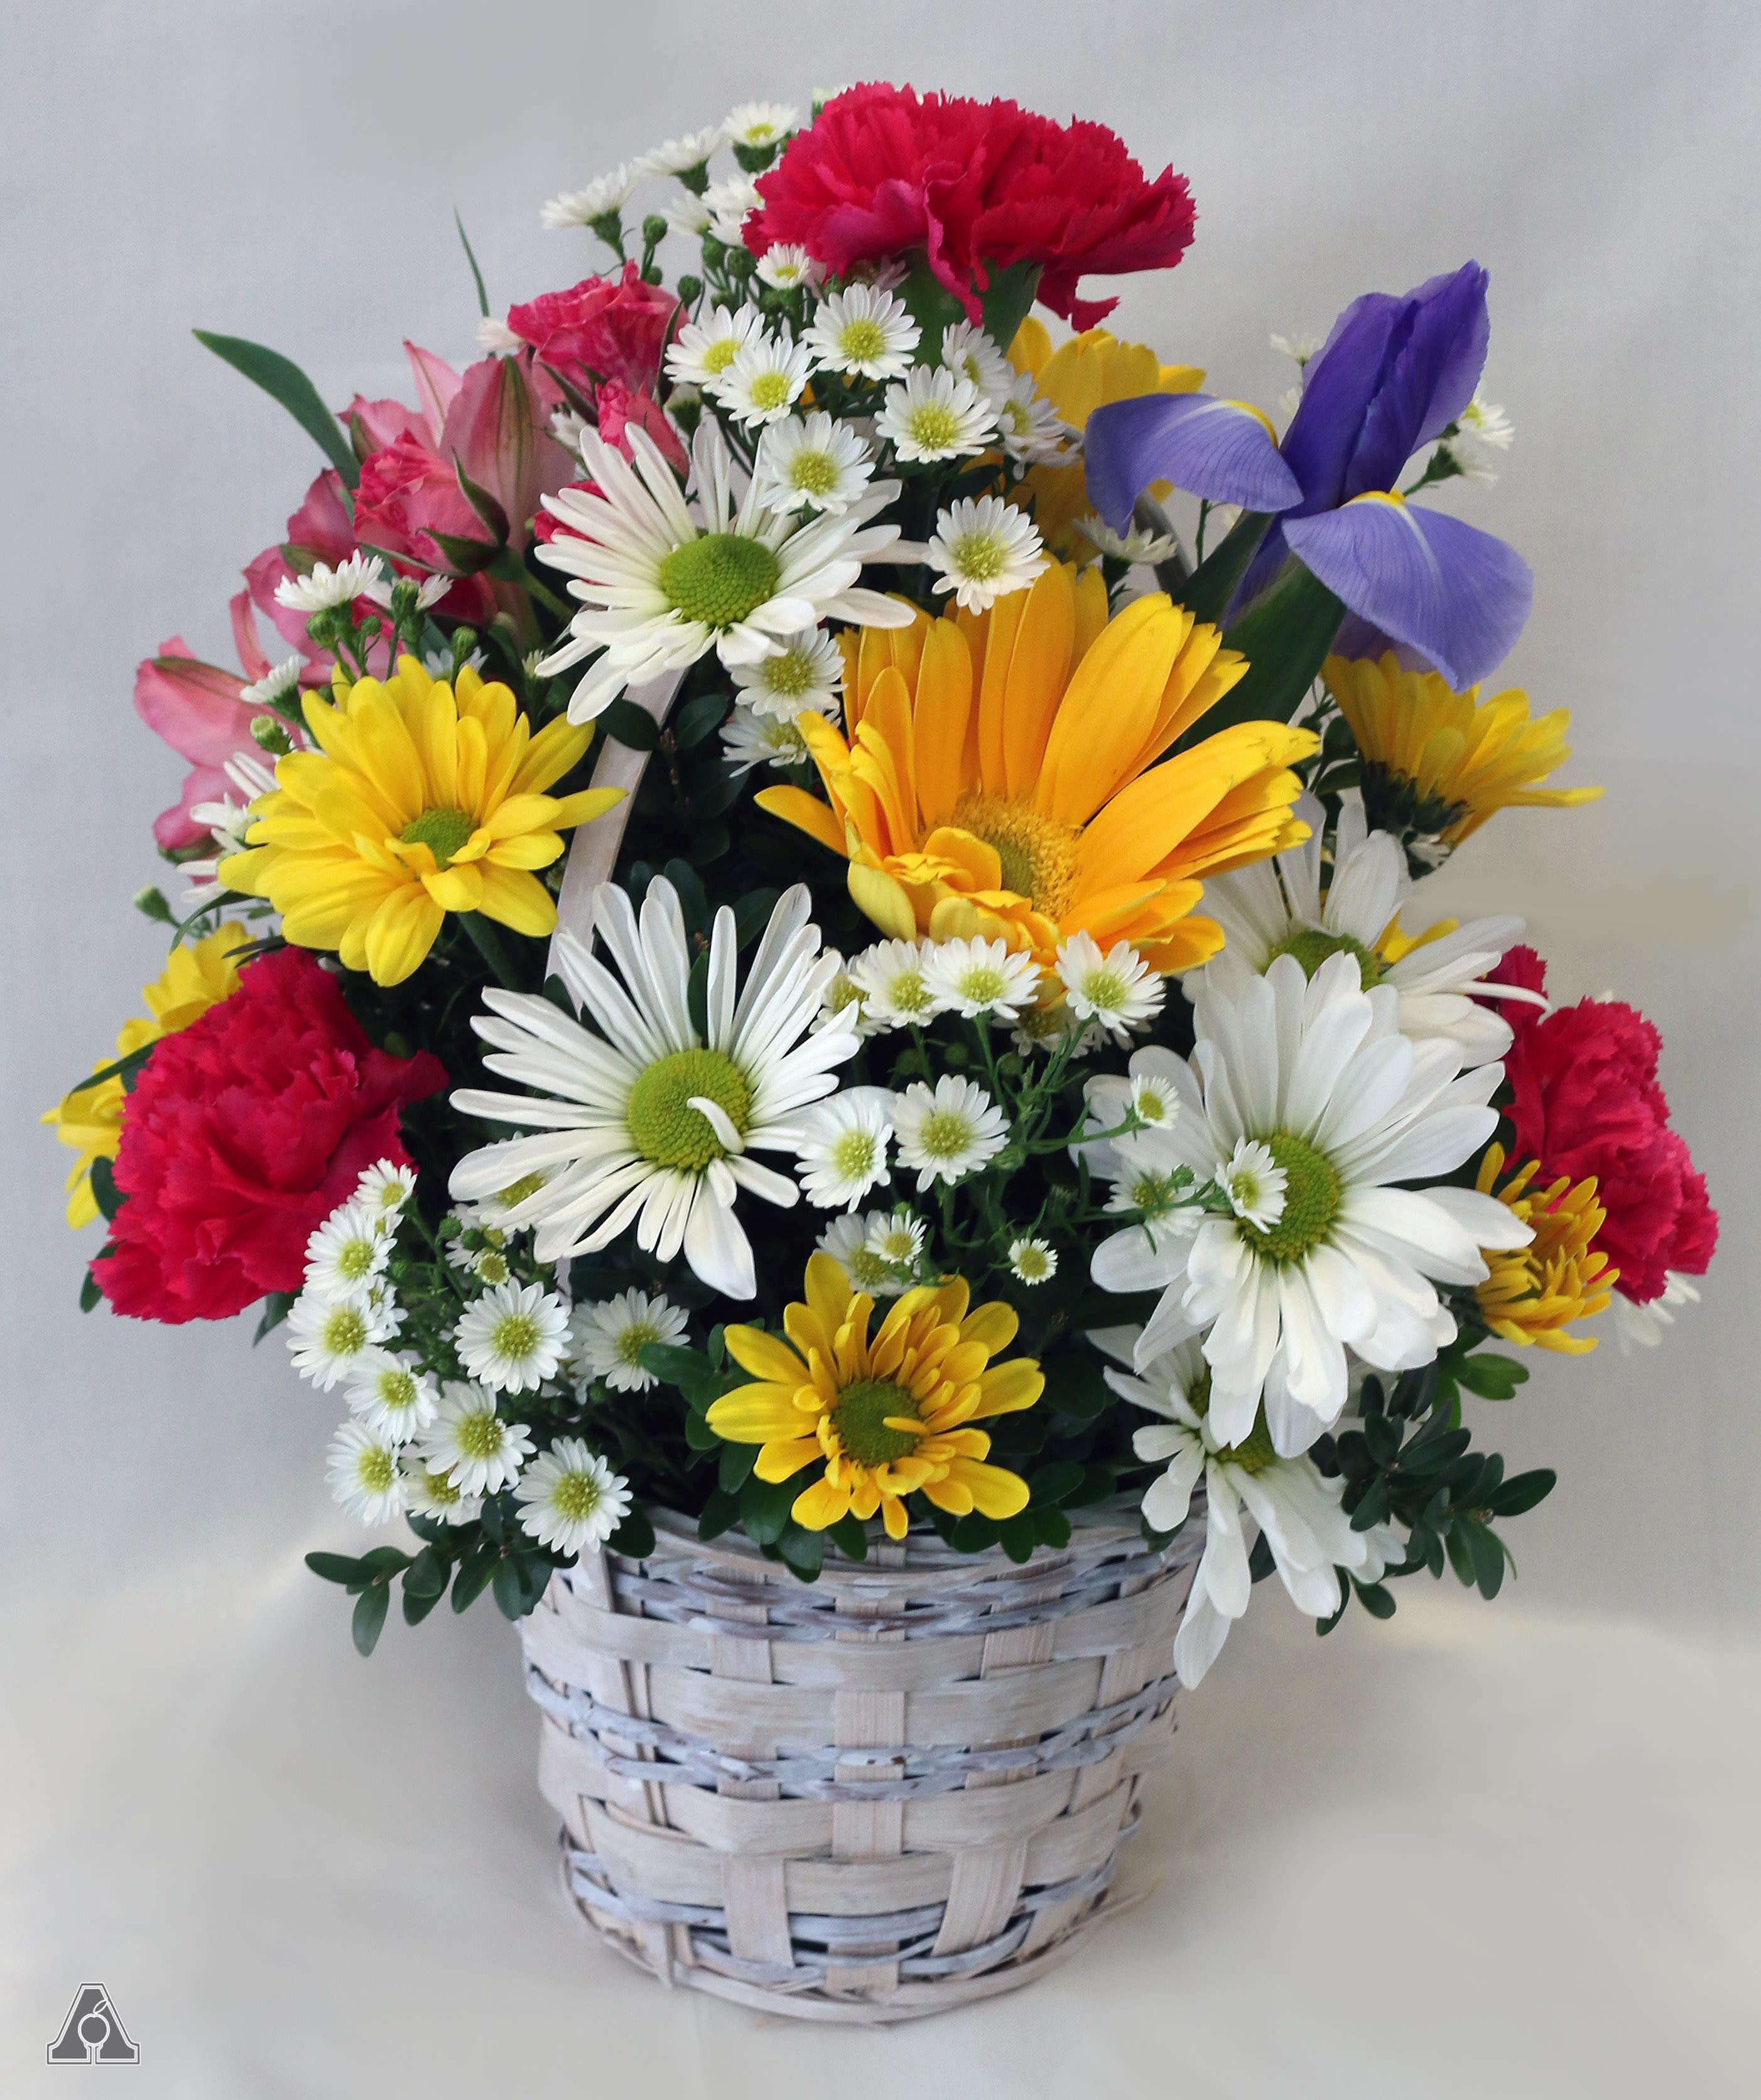 Fresh Spring Basket In Amherst Ma Atkins Farms Flower Shop